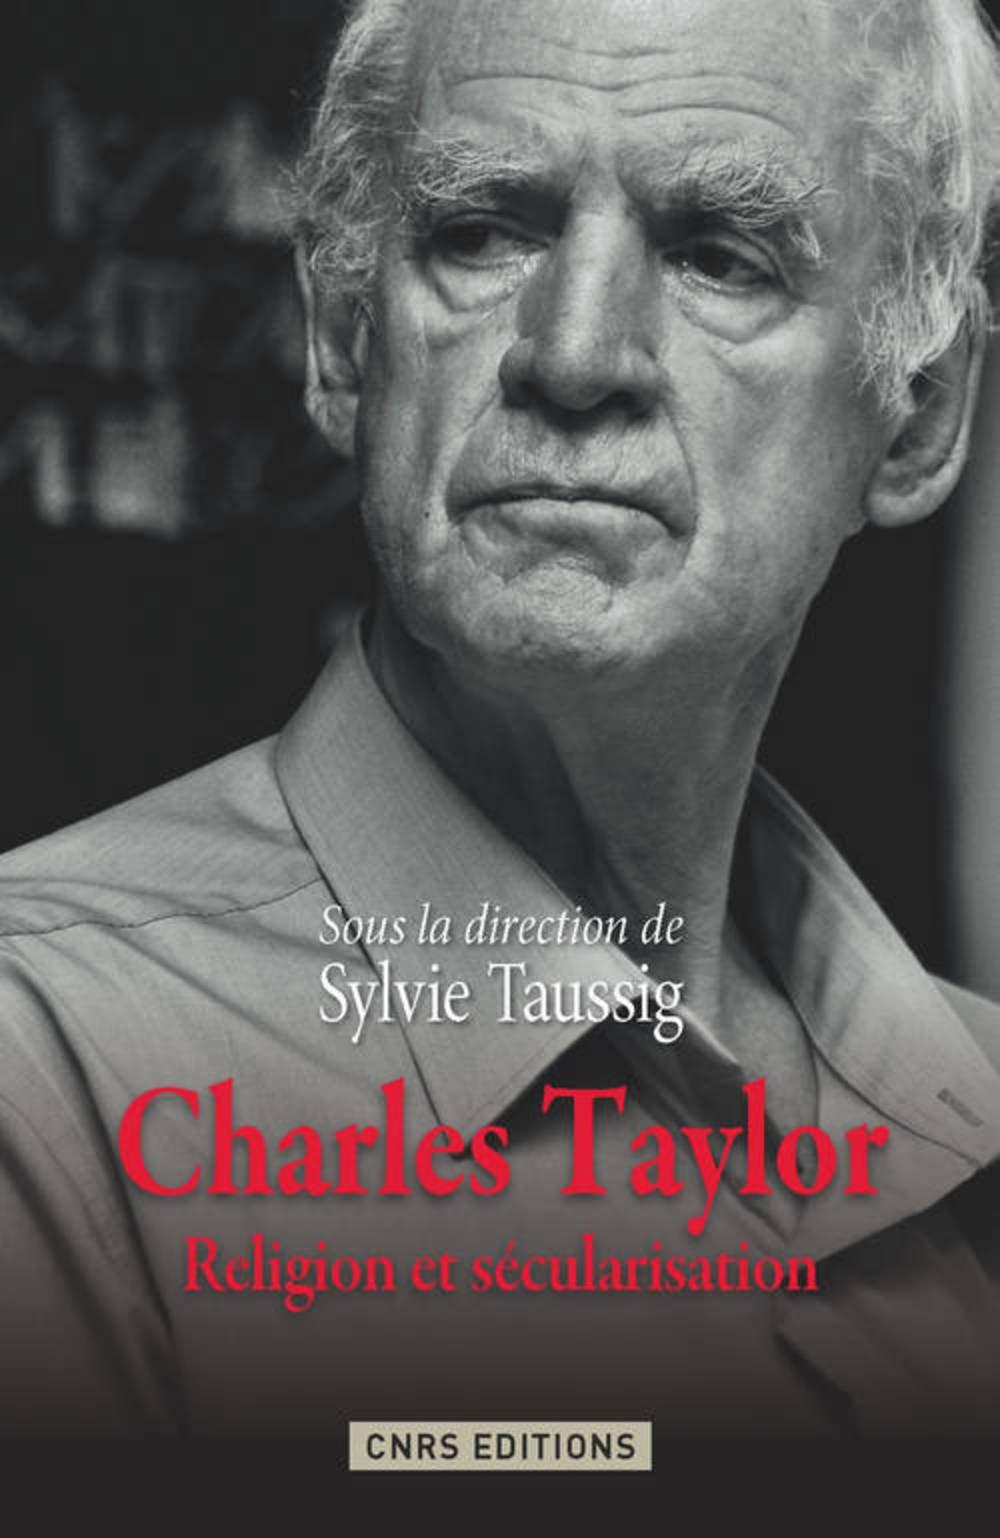 Charles Taylor. Religion et sécularisation, Sylvie Taussig (dir.)